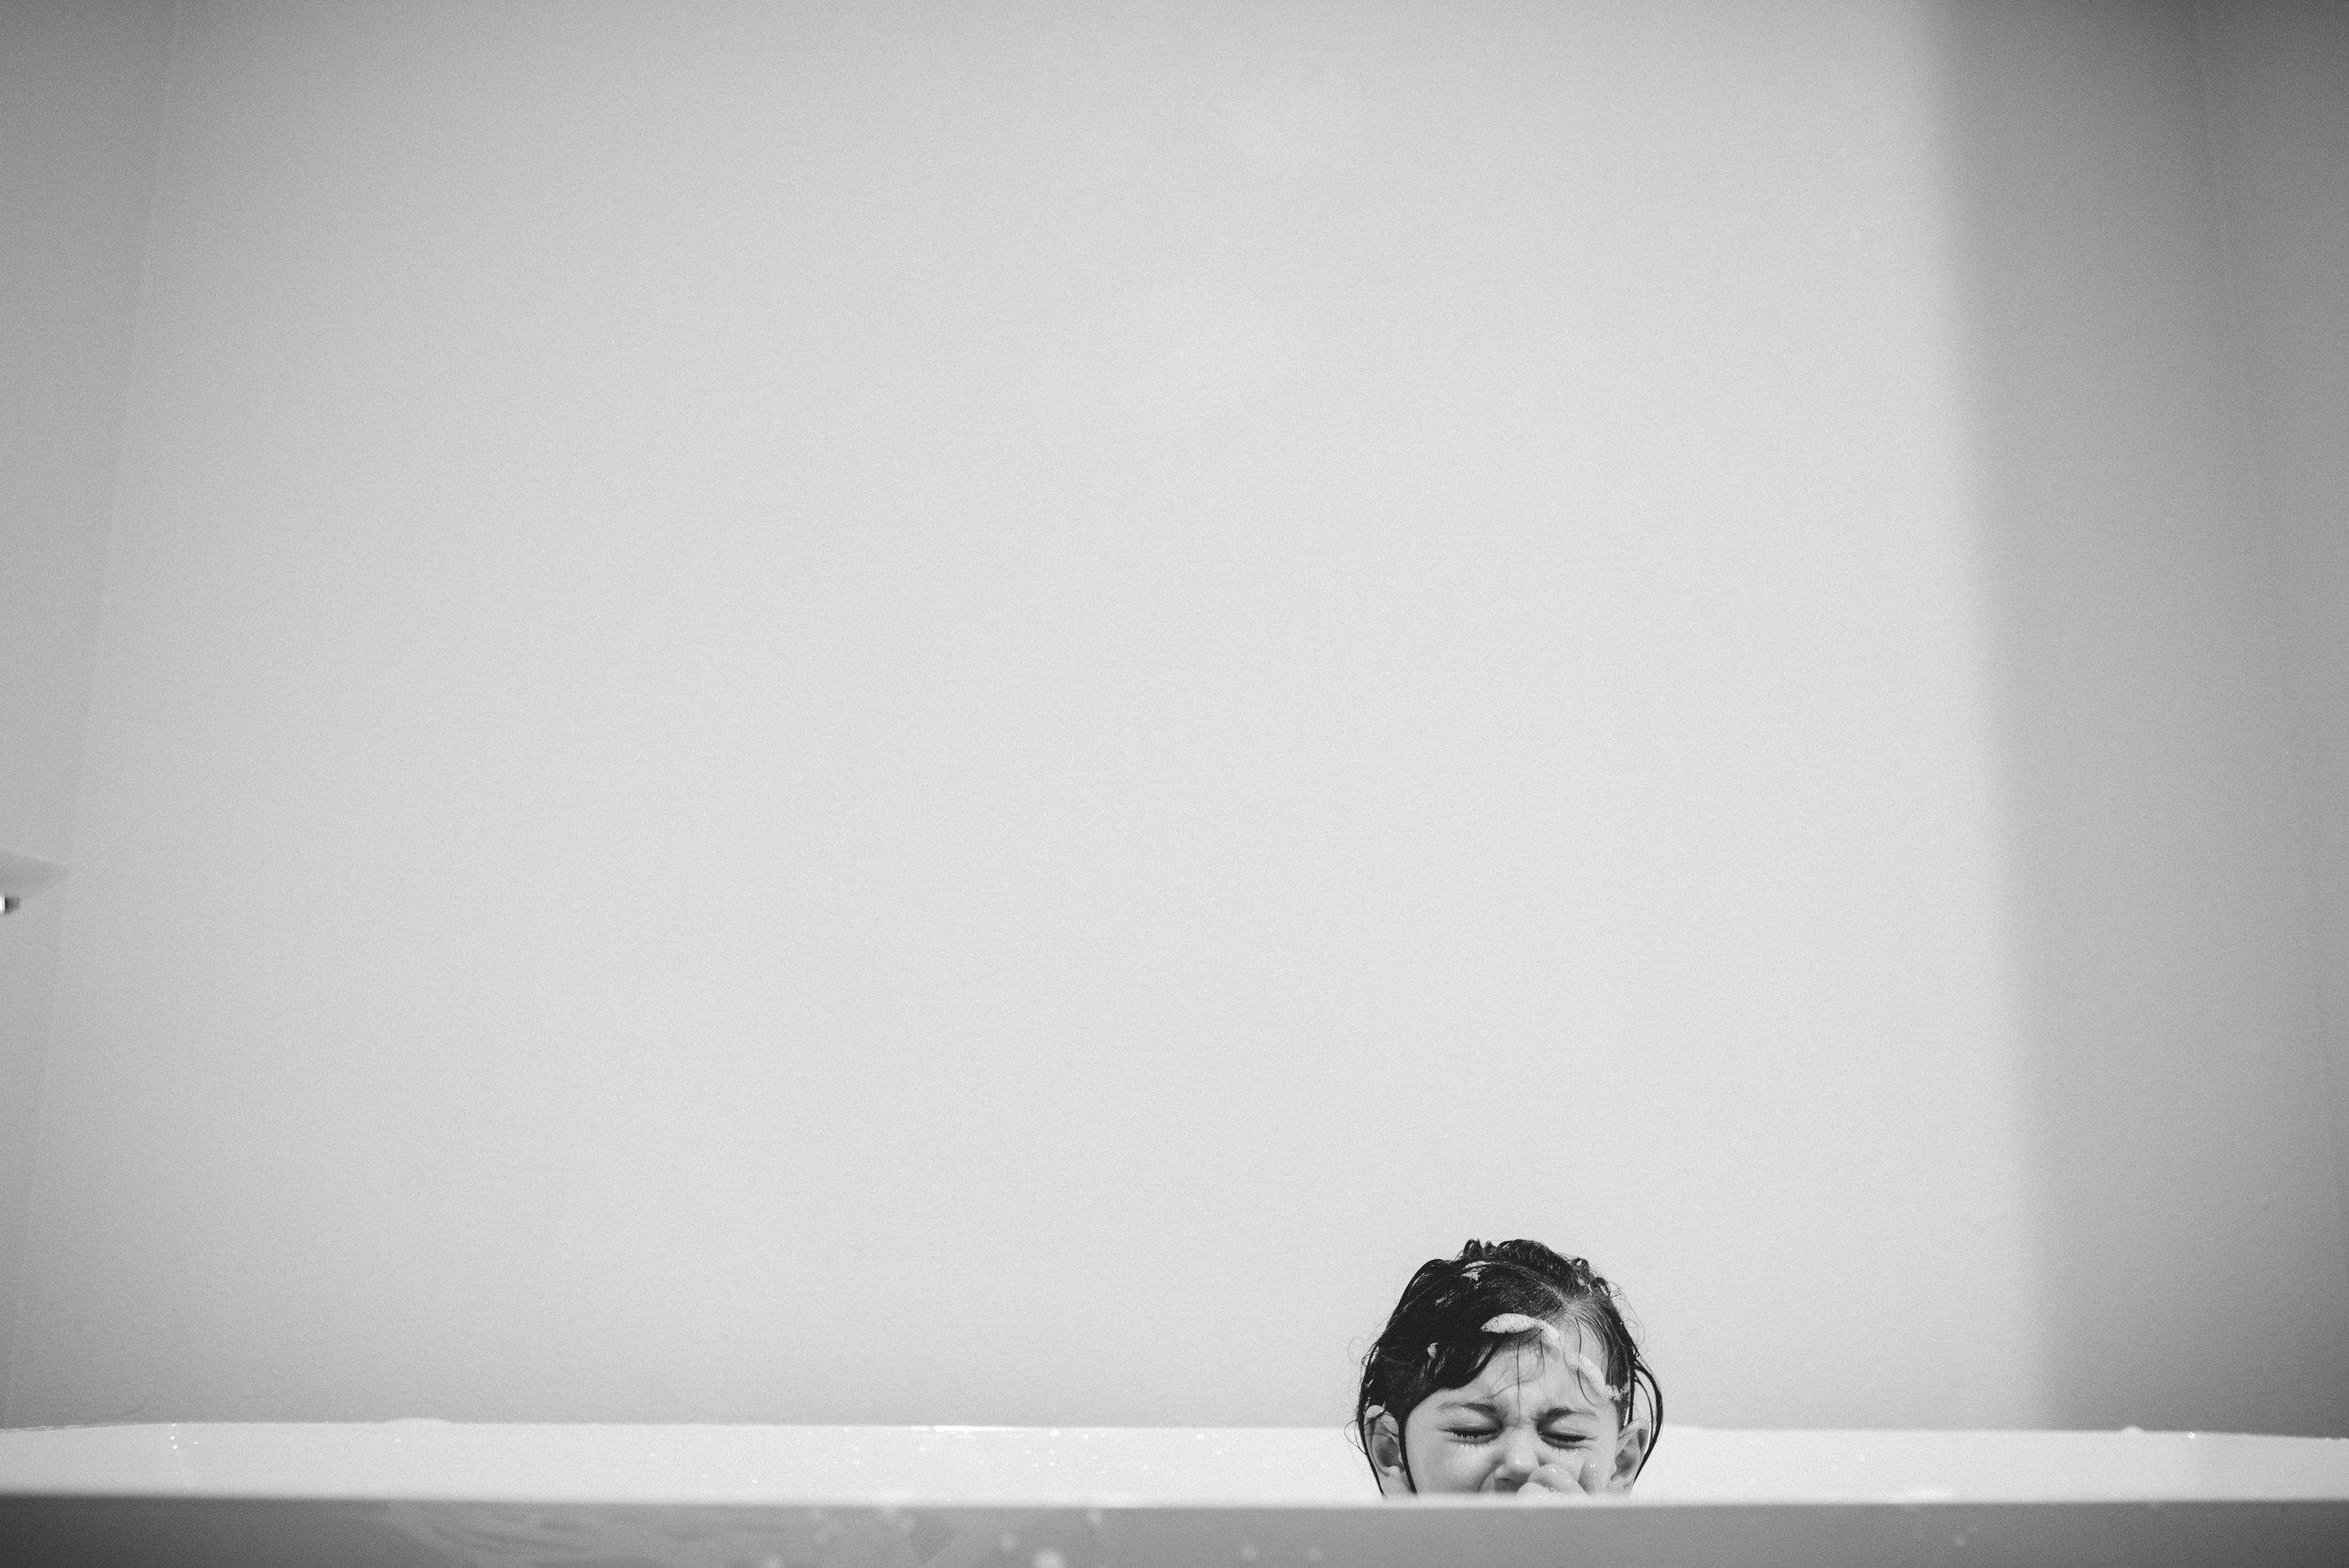 candid colorado family photo bath time